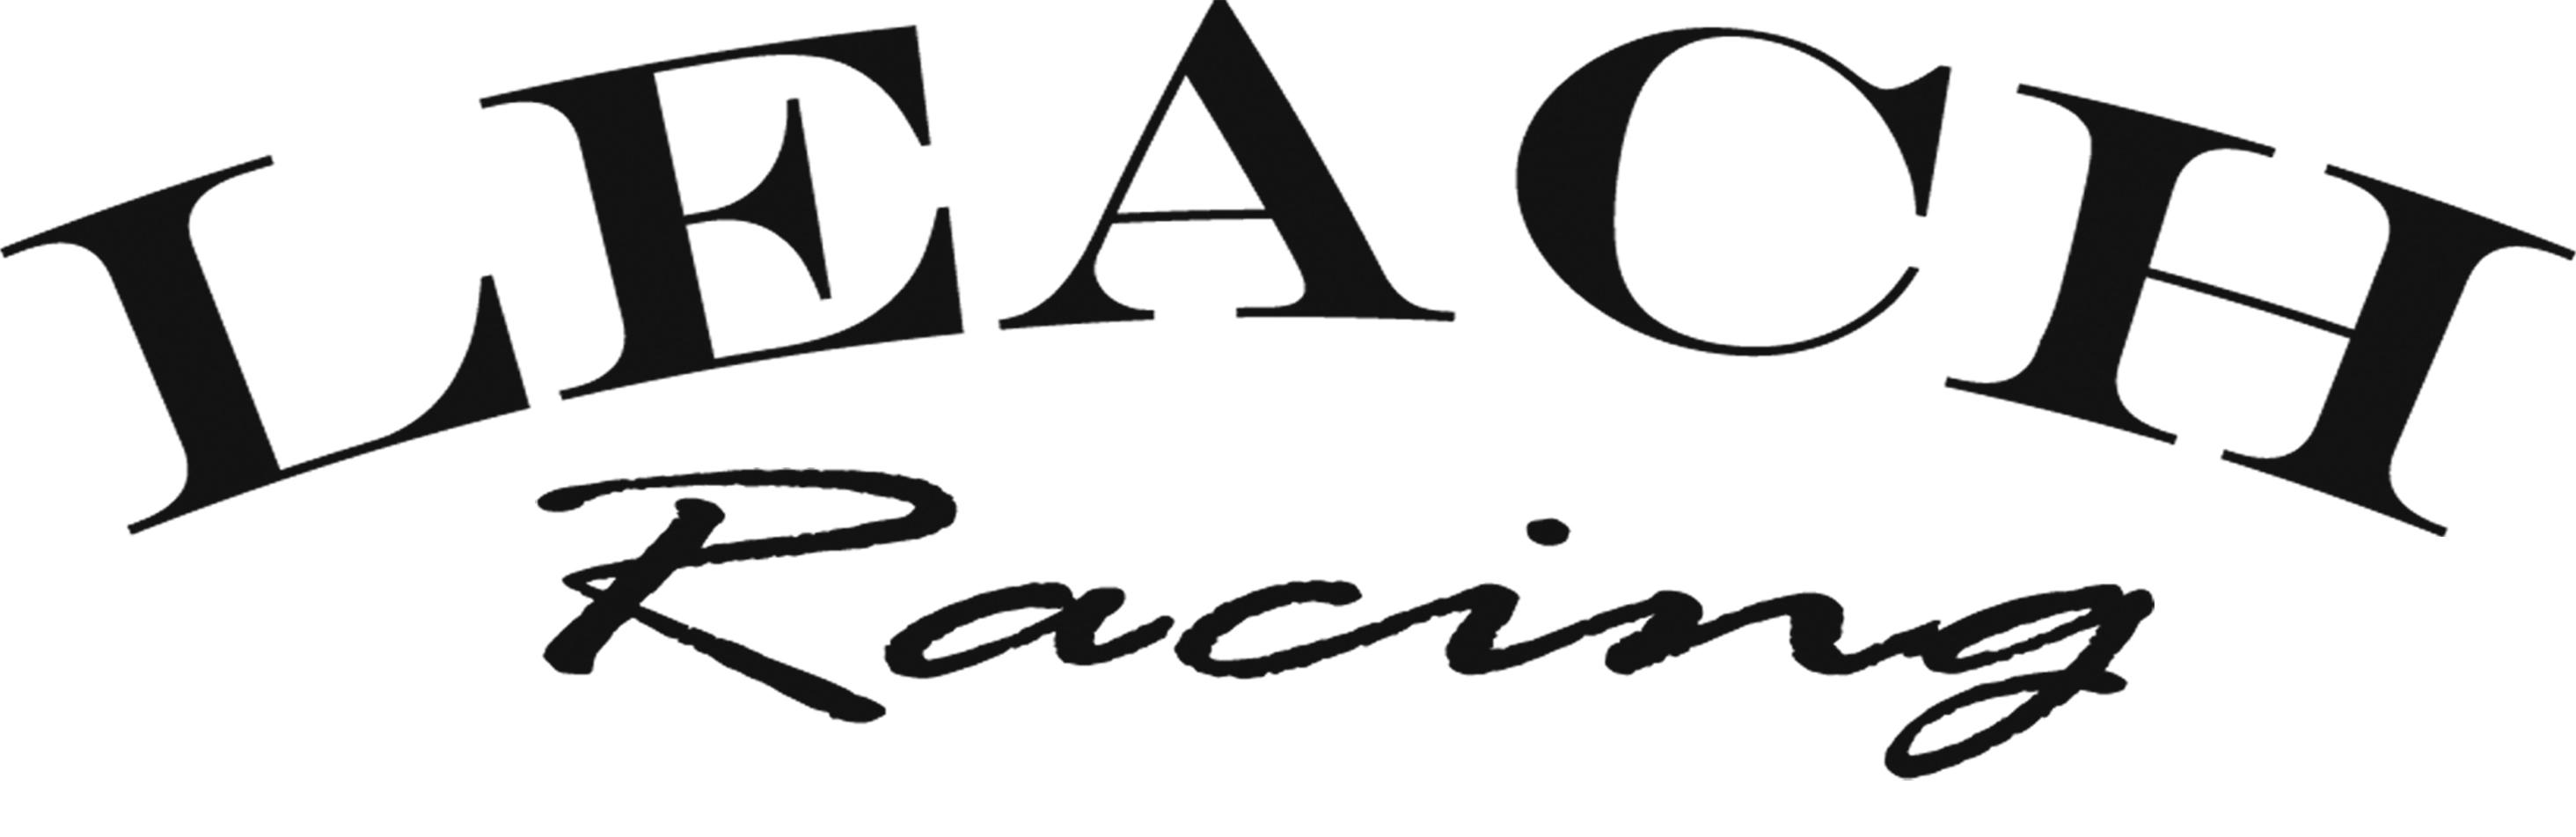 Leach Racing